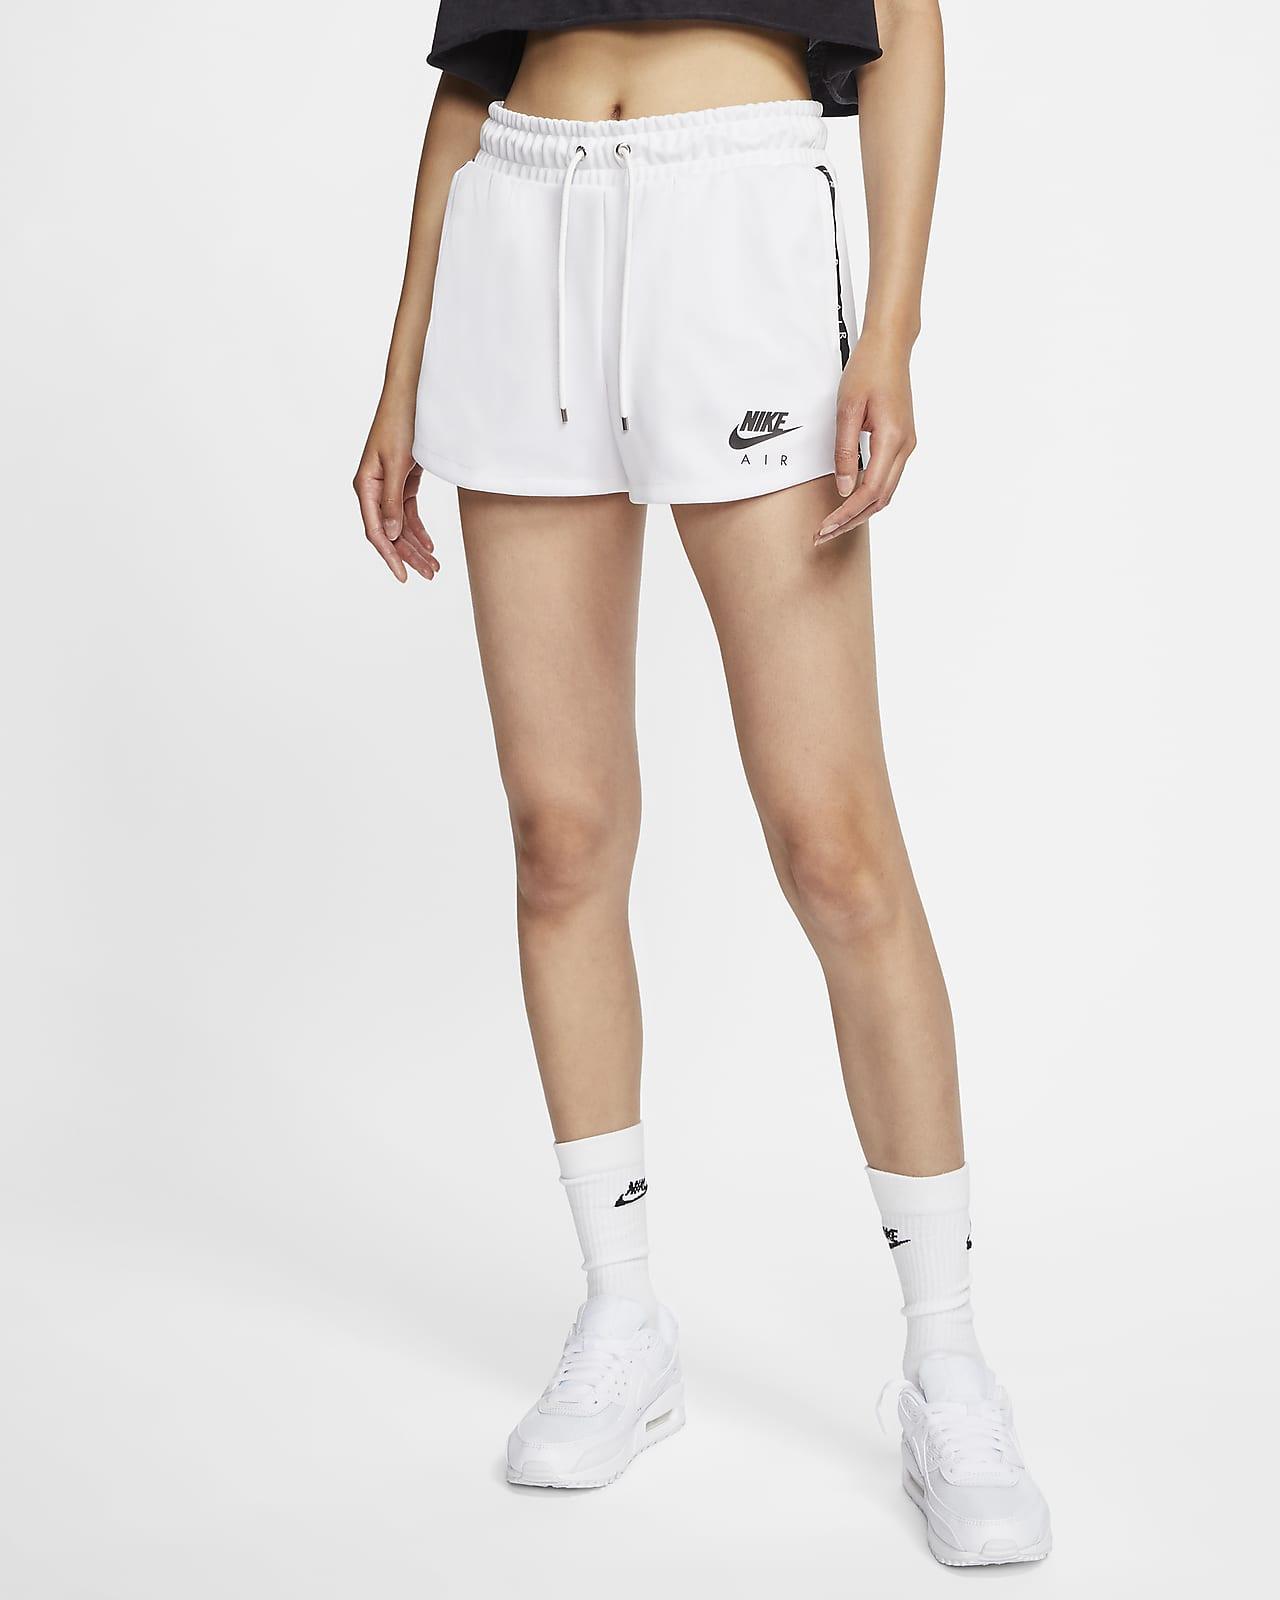 Nike Air Women's Shorts. Nike SG